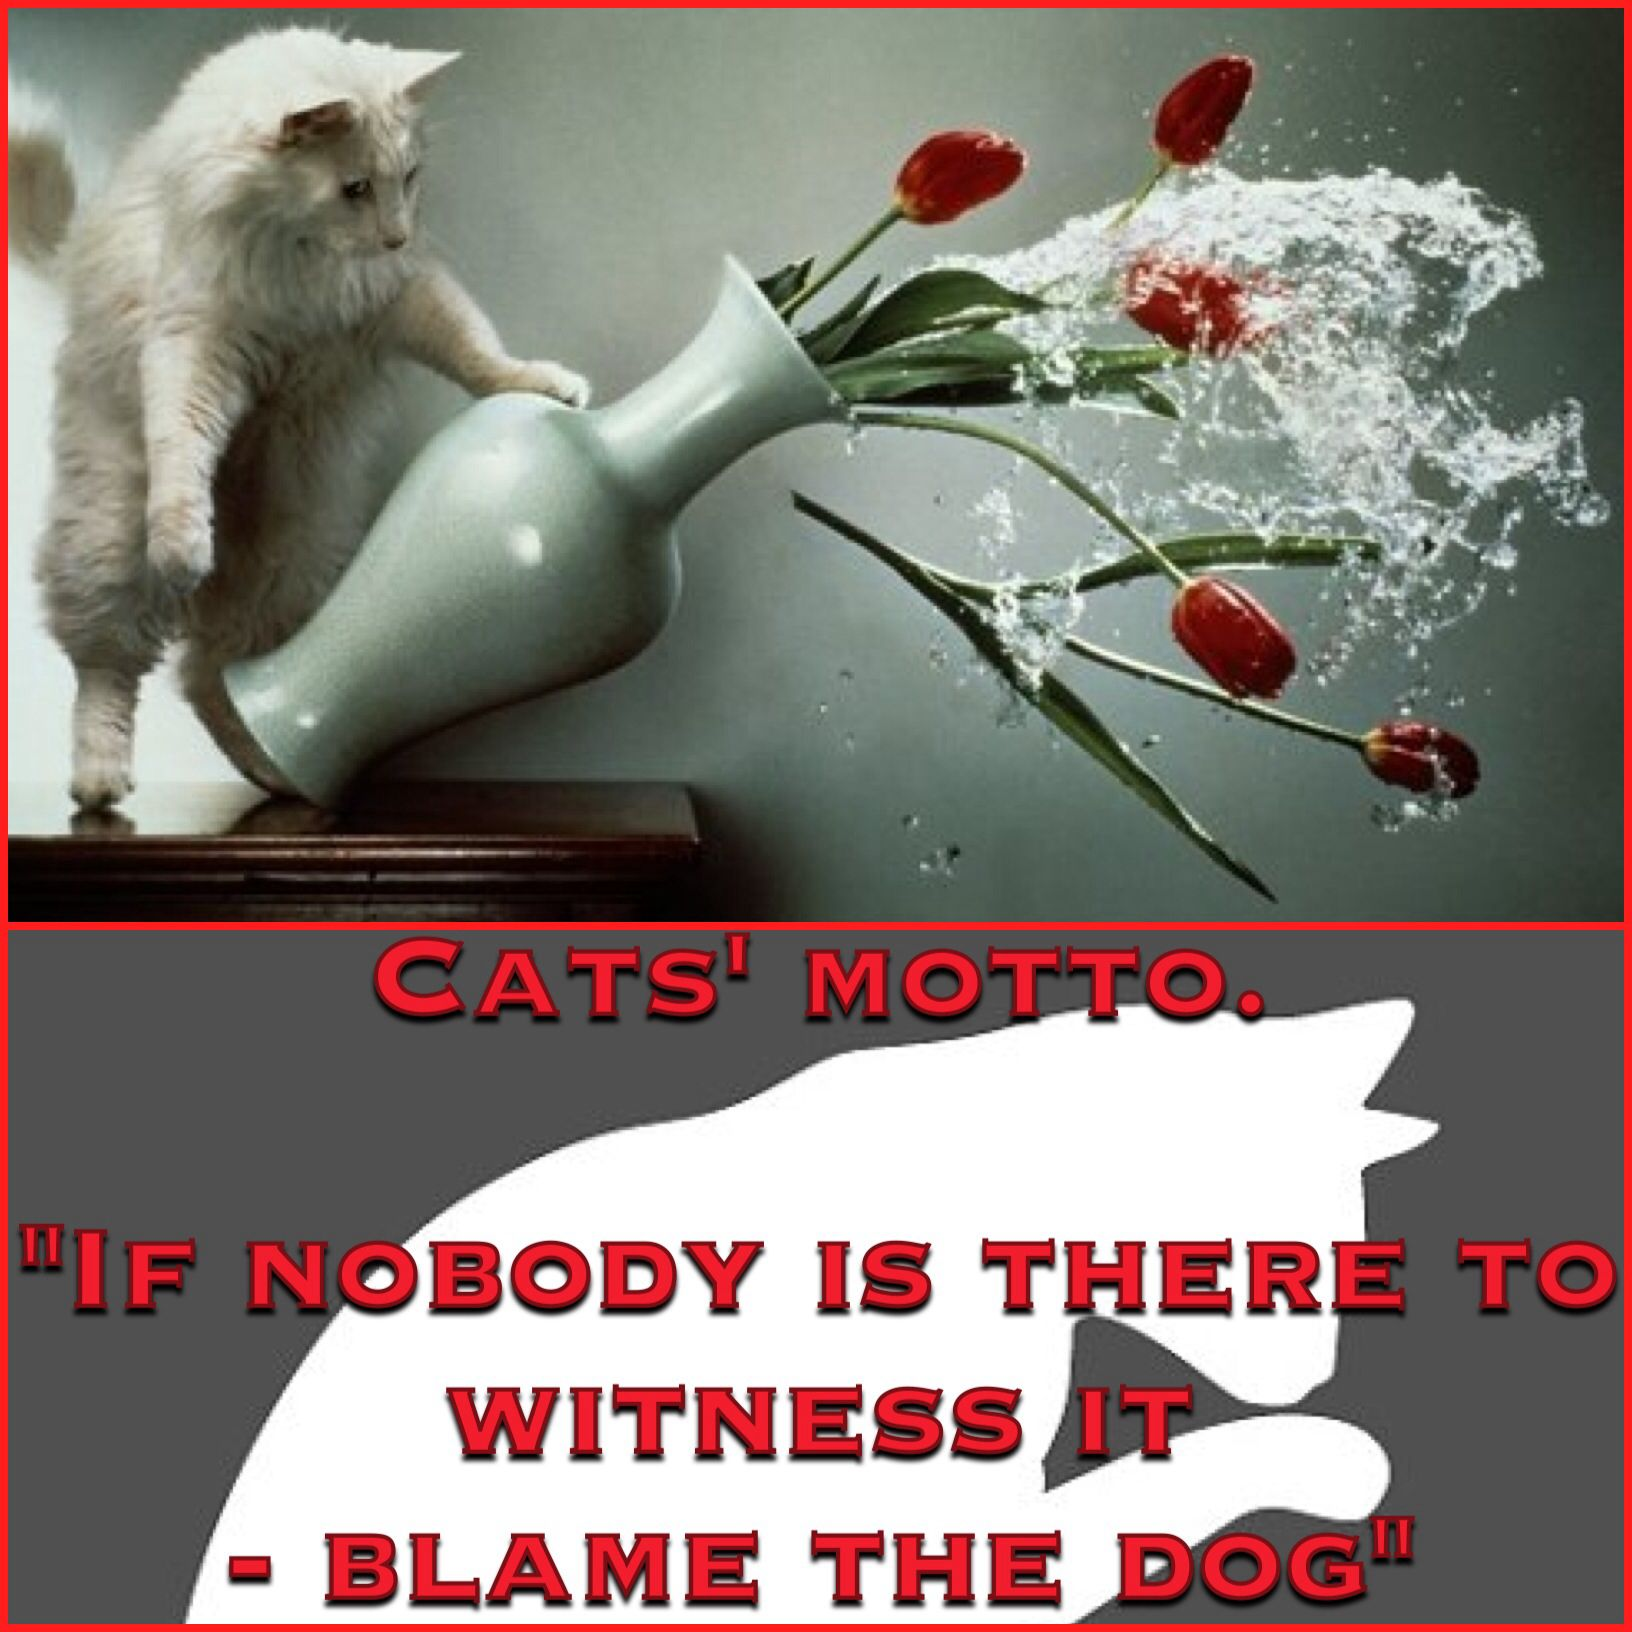 Cats' motto